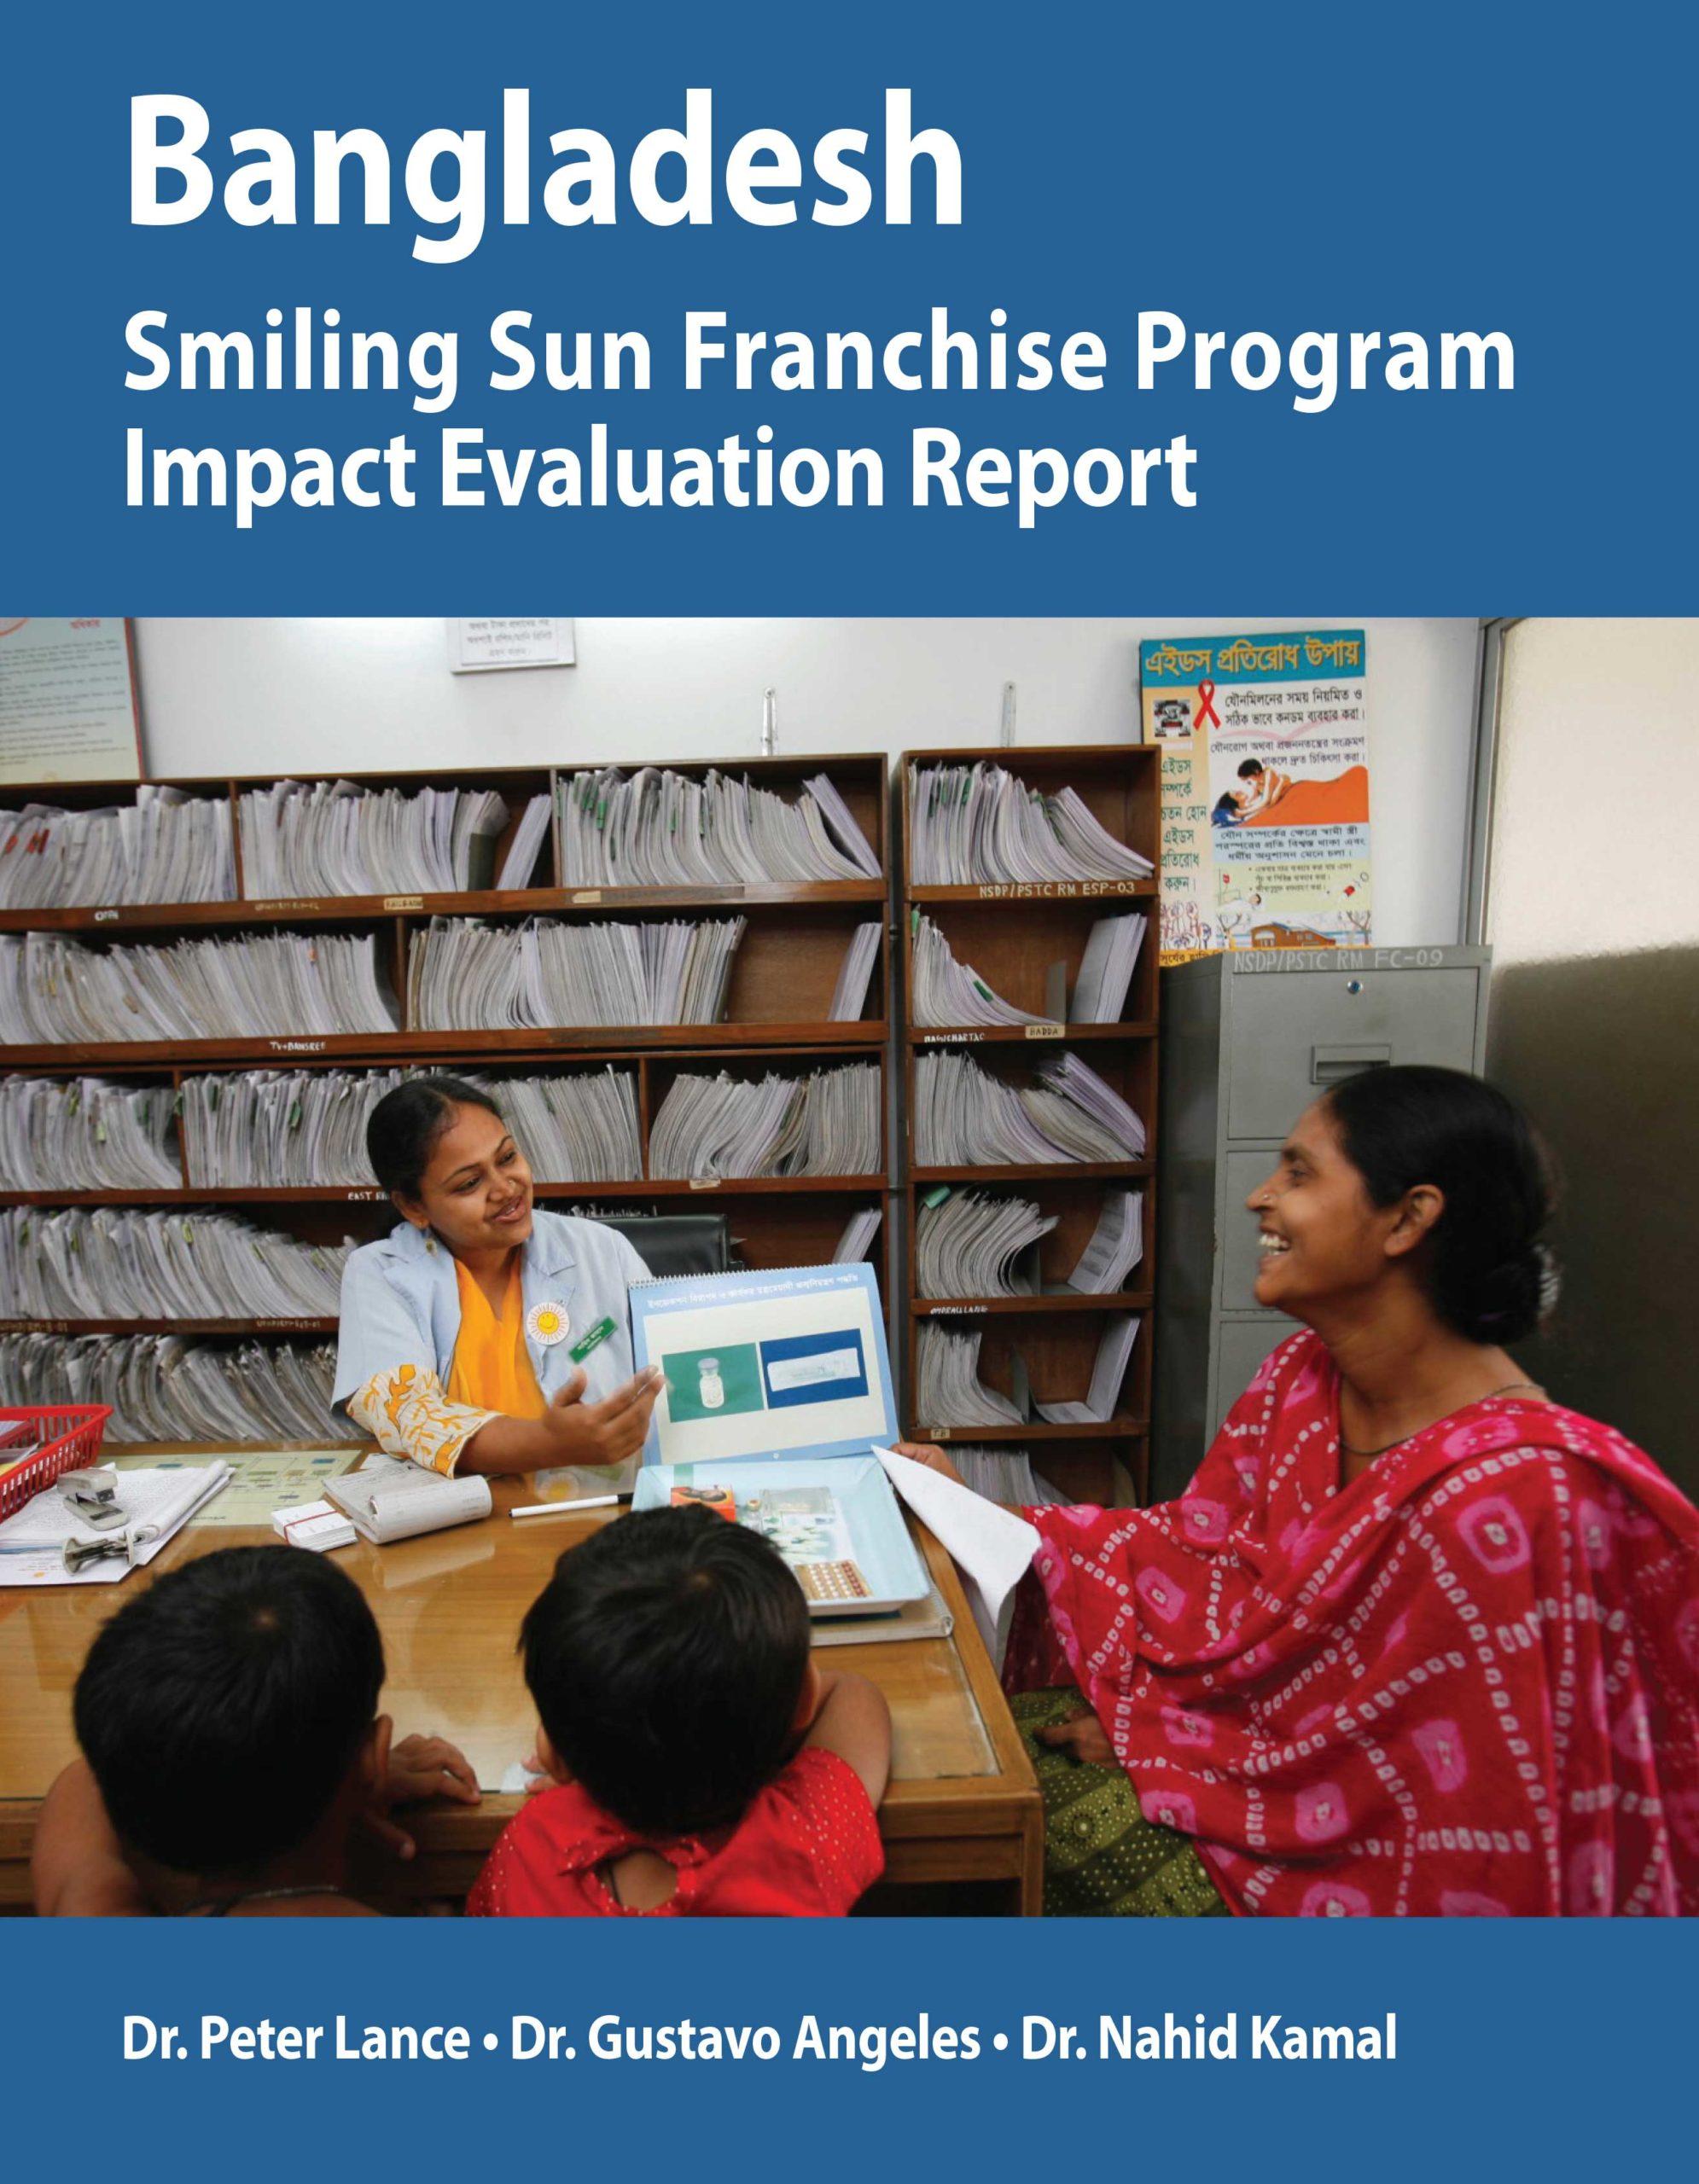 Bangladesh Smiling Sun Franchise Program Impact Evaluation Report